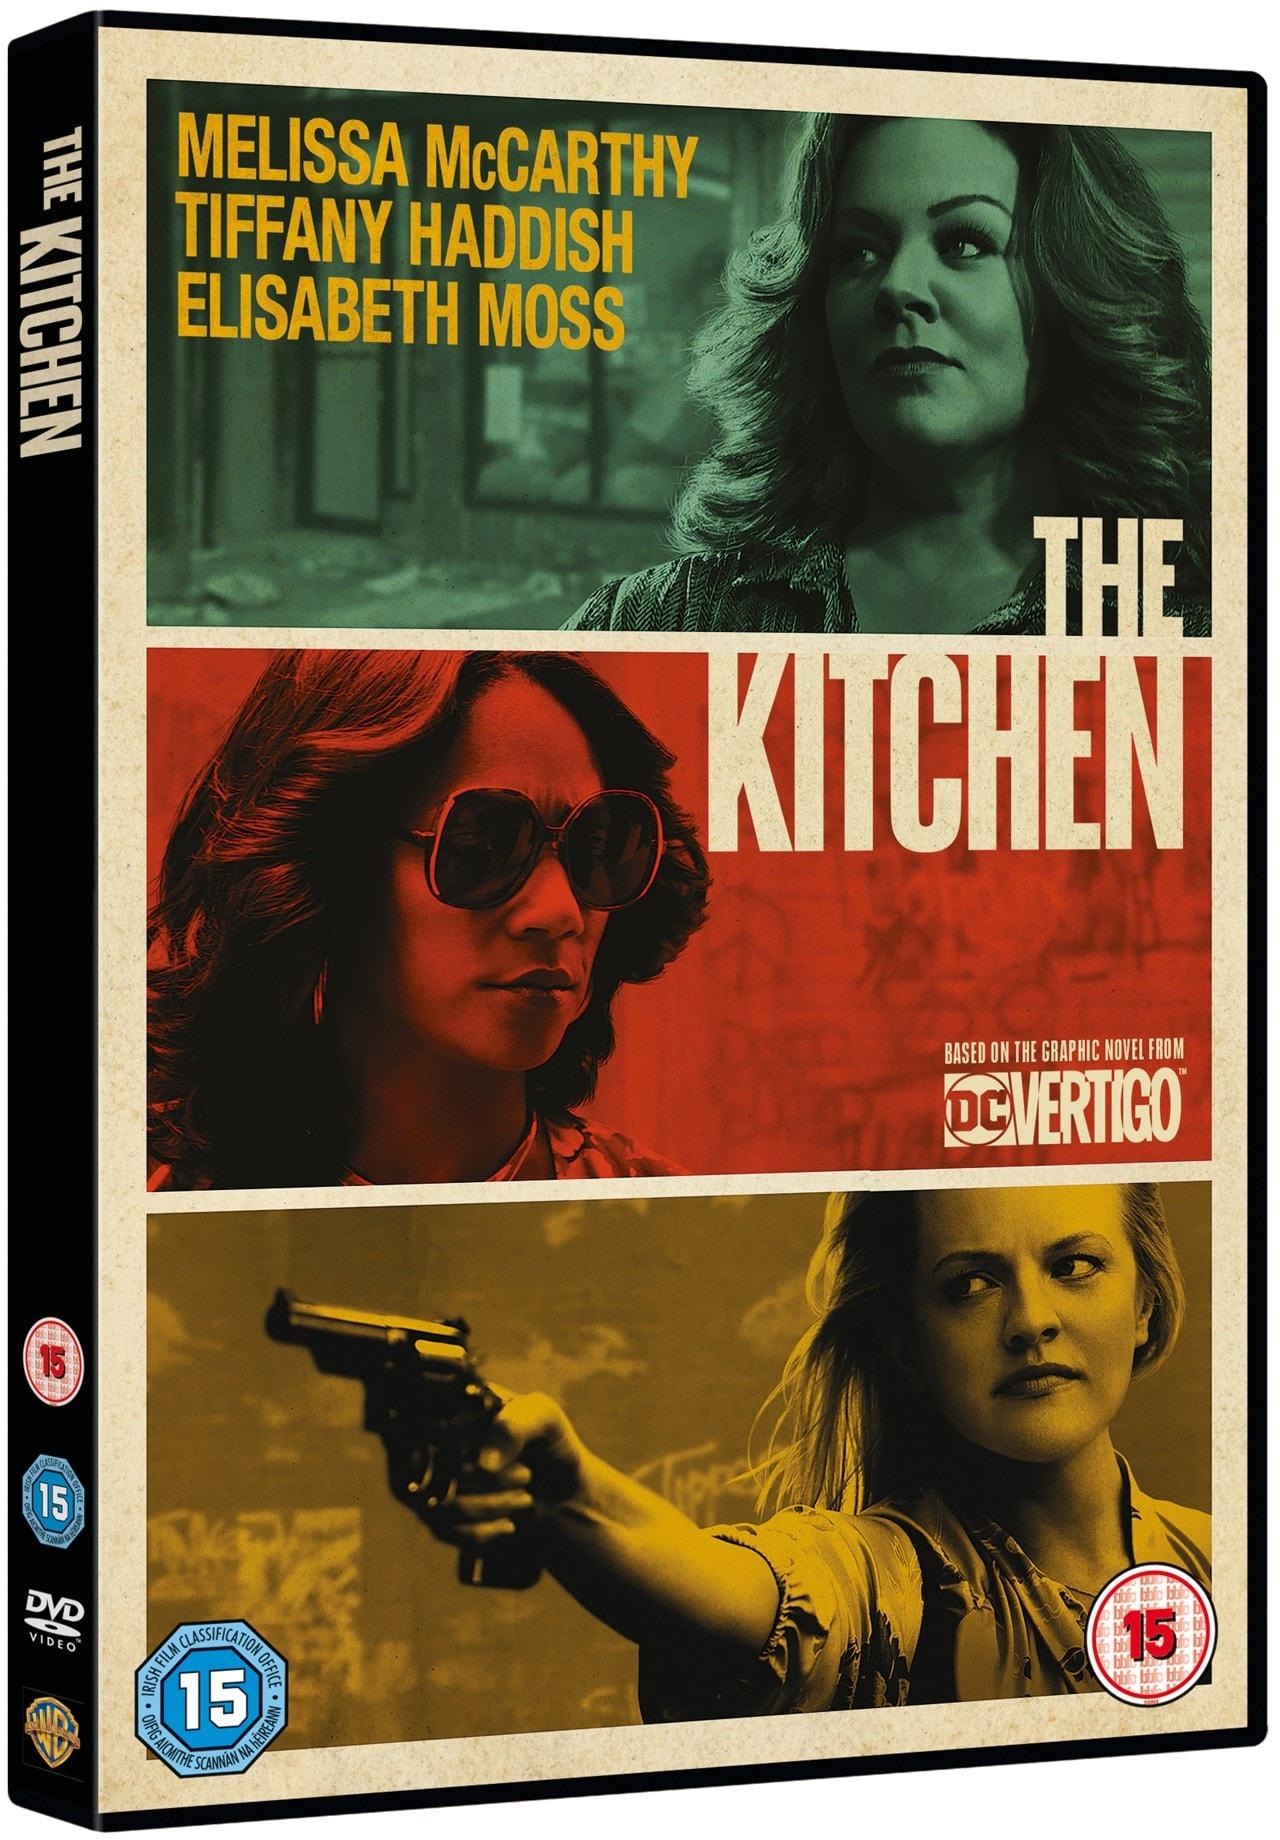 The Kitchen - 2